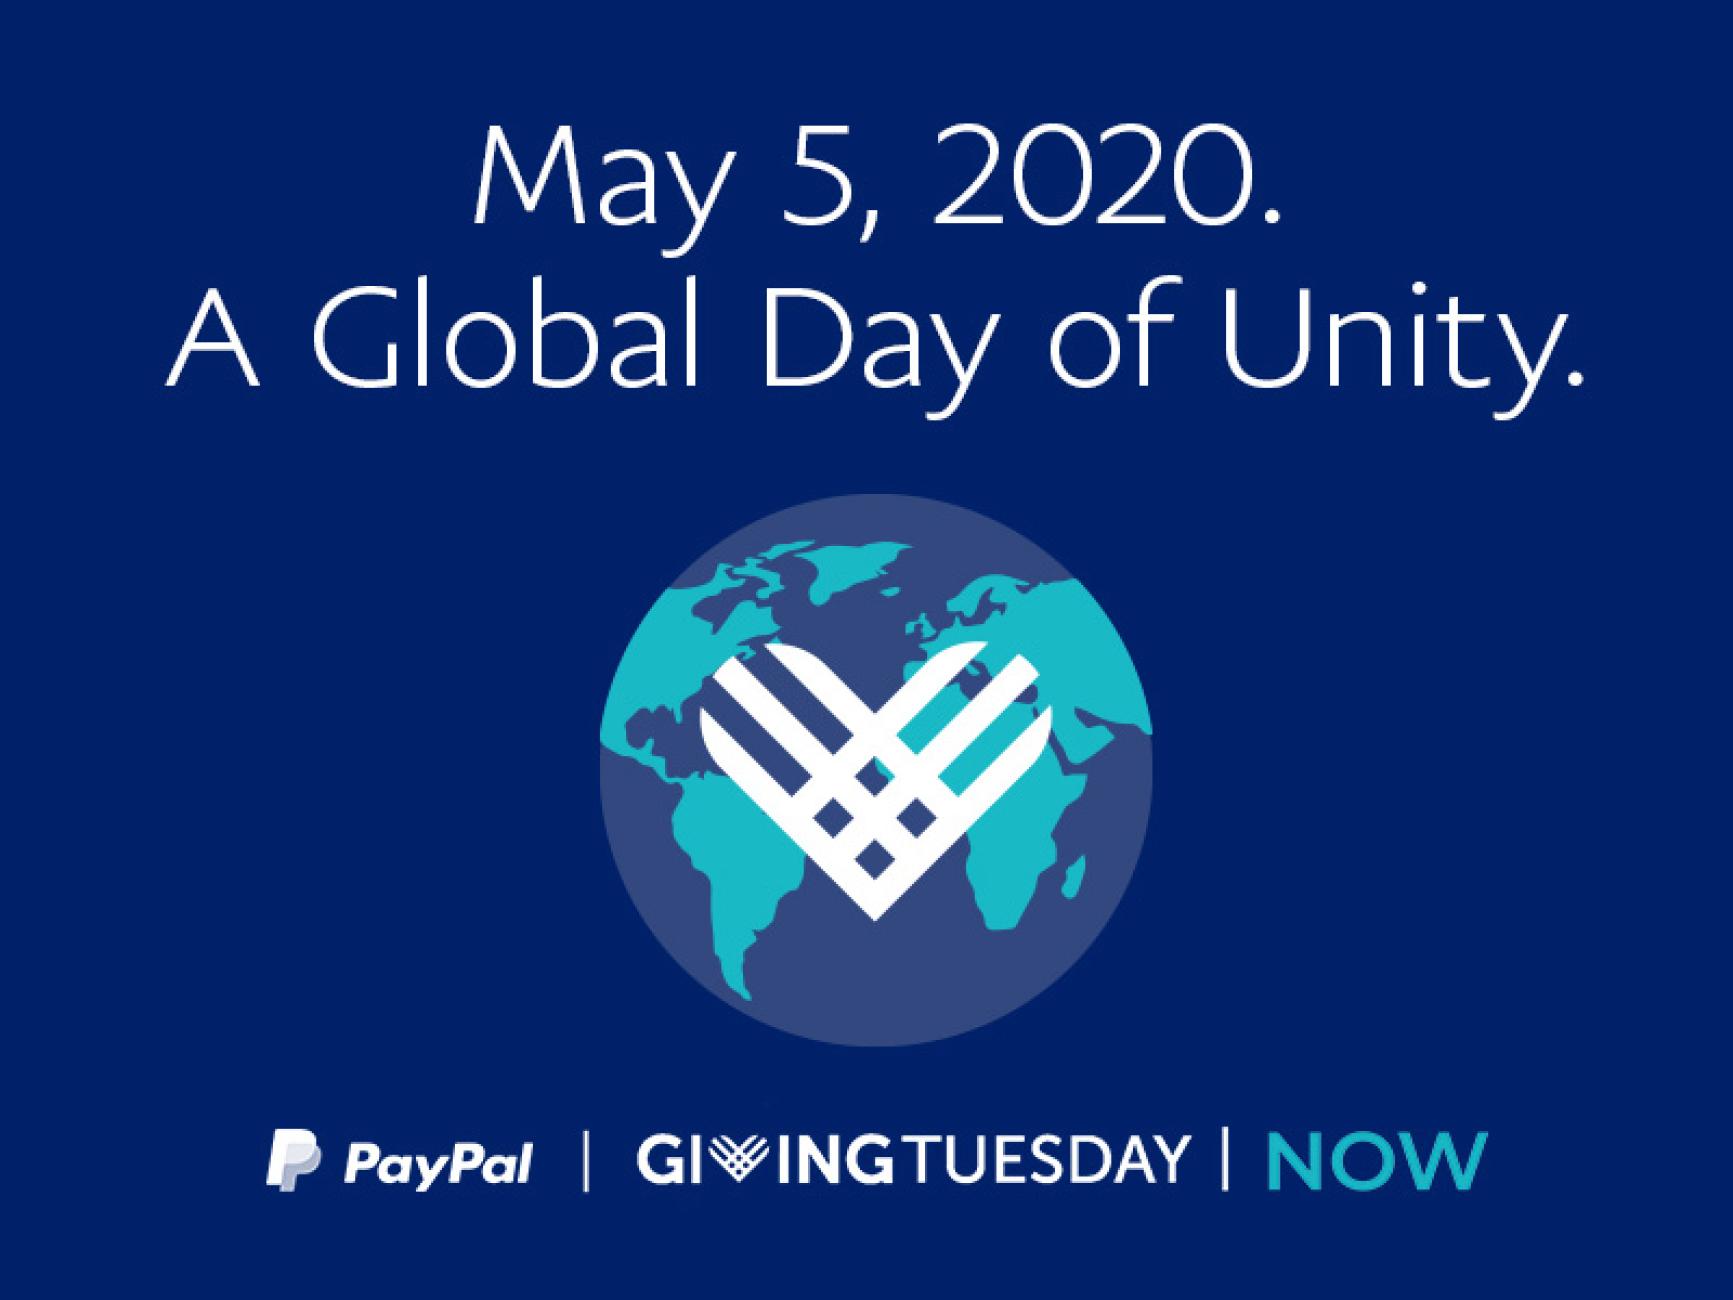 PayPal e GivingTuesday.org collaborano contro il virus thumbnail